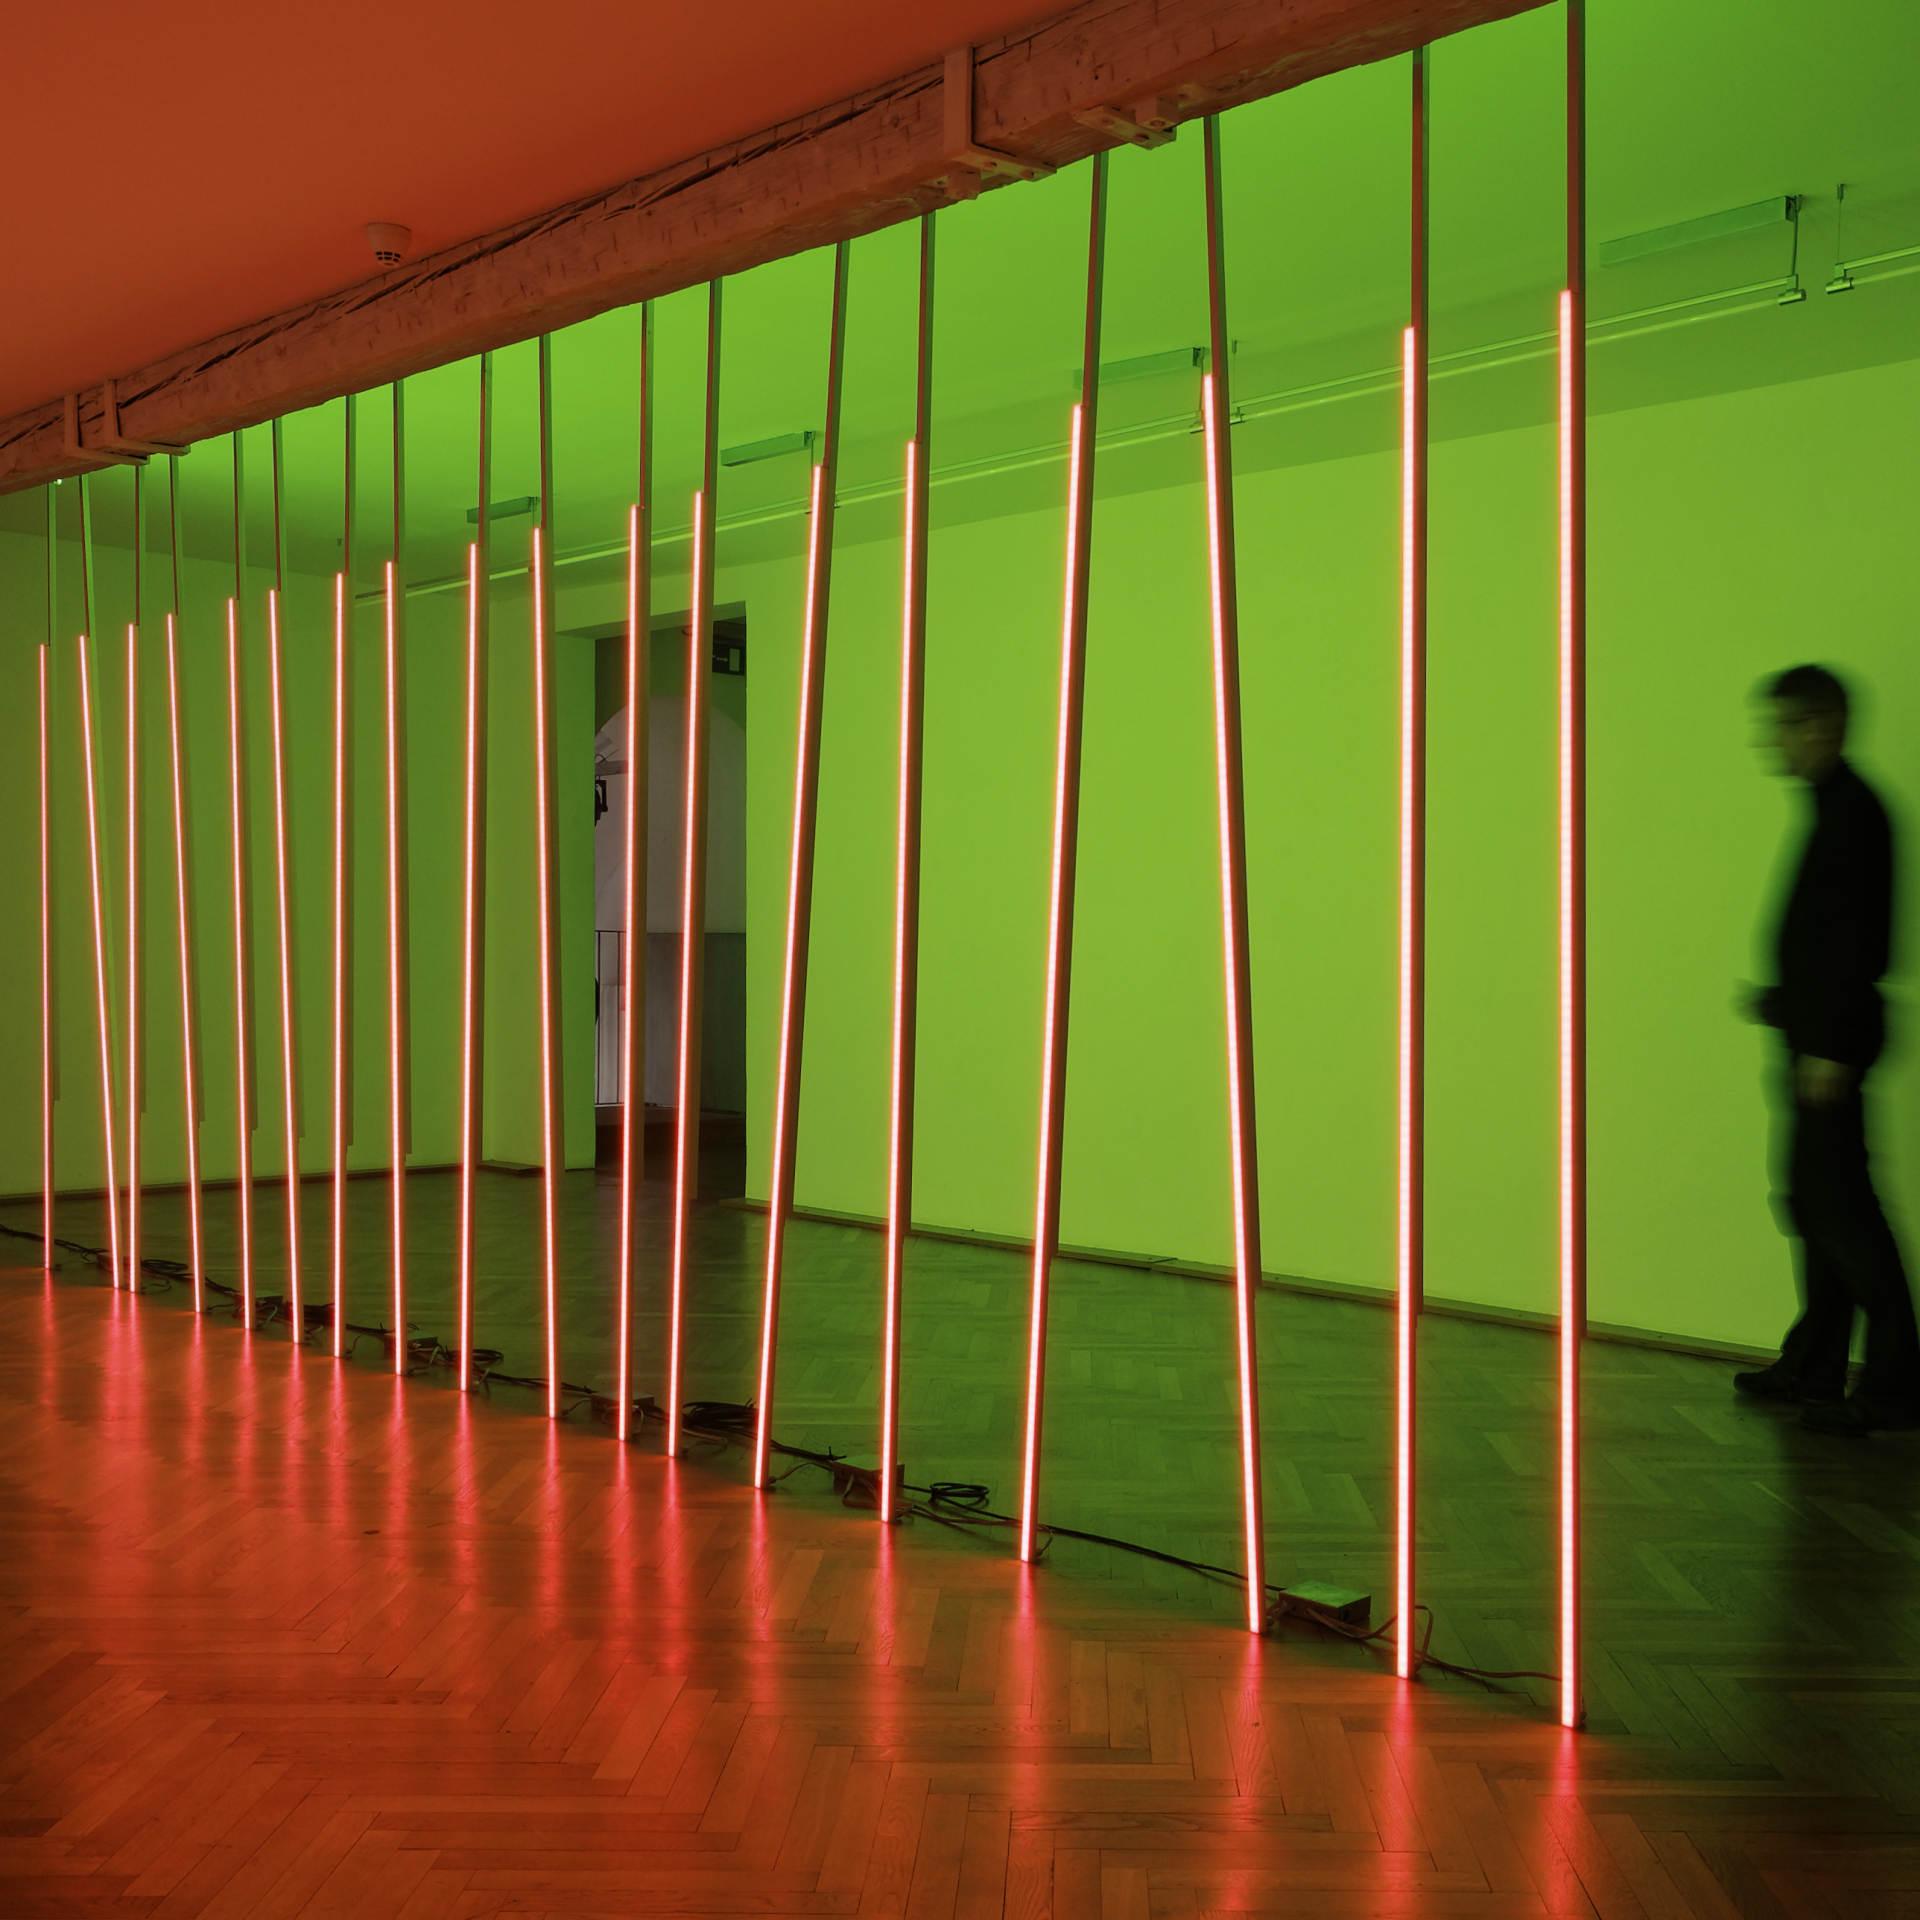 daniel_hausig_fachwerk_2009_light_installation